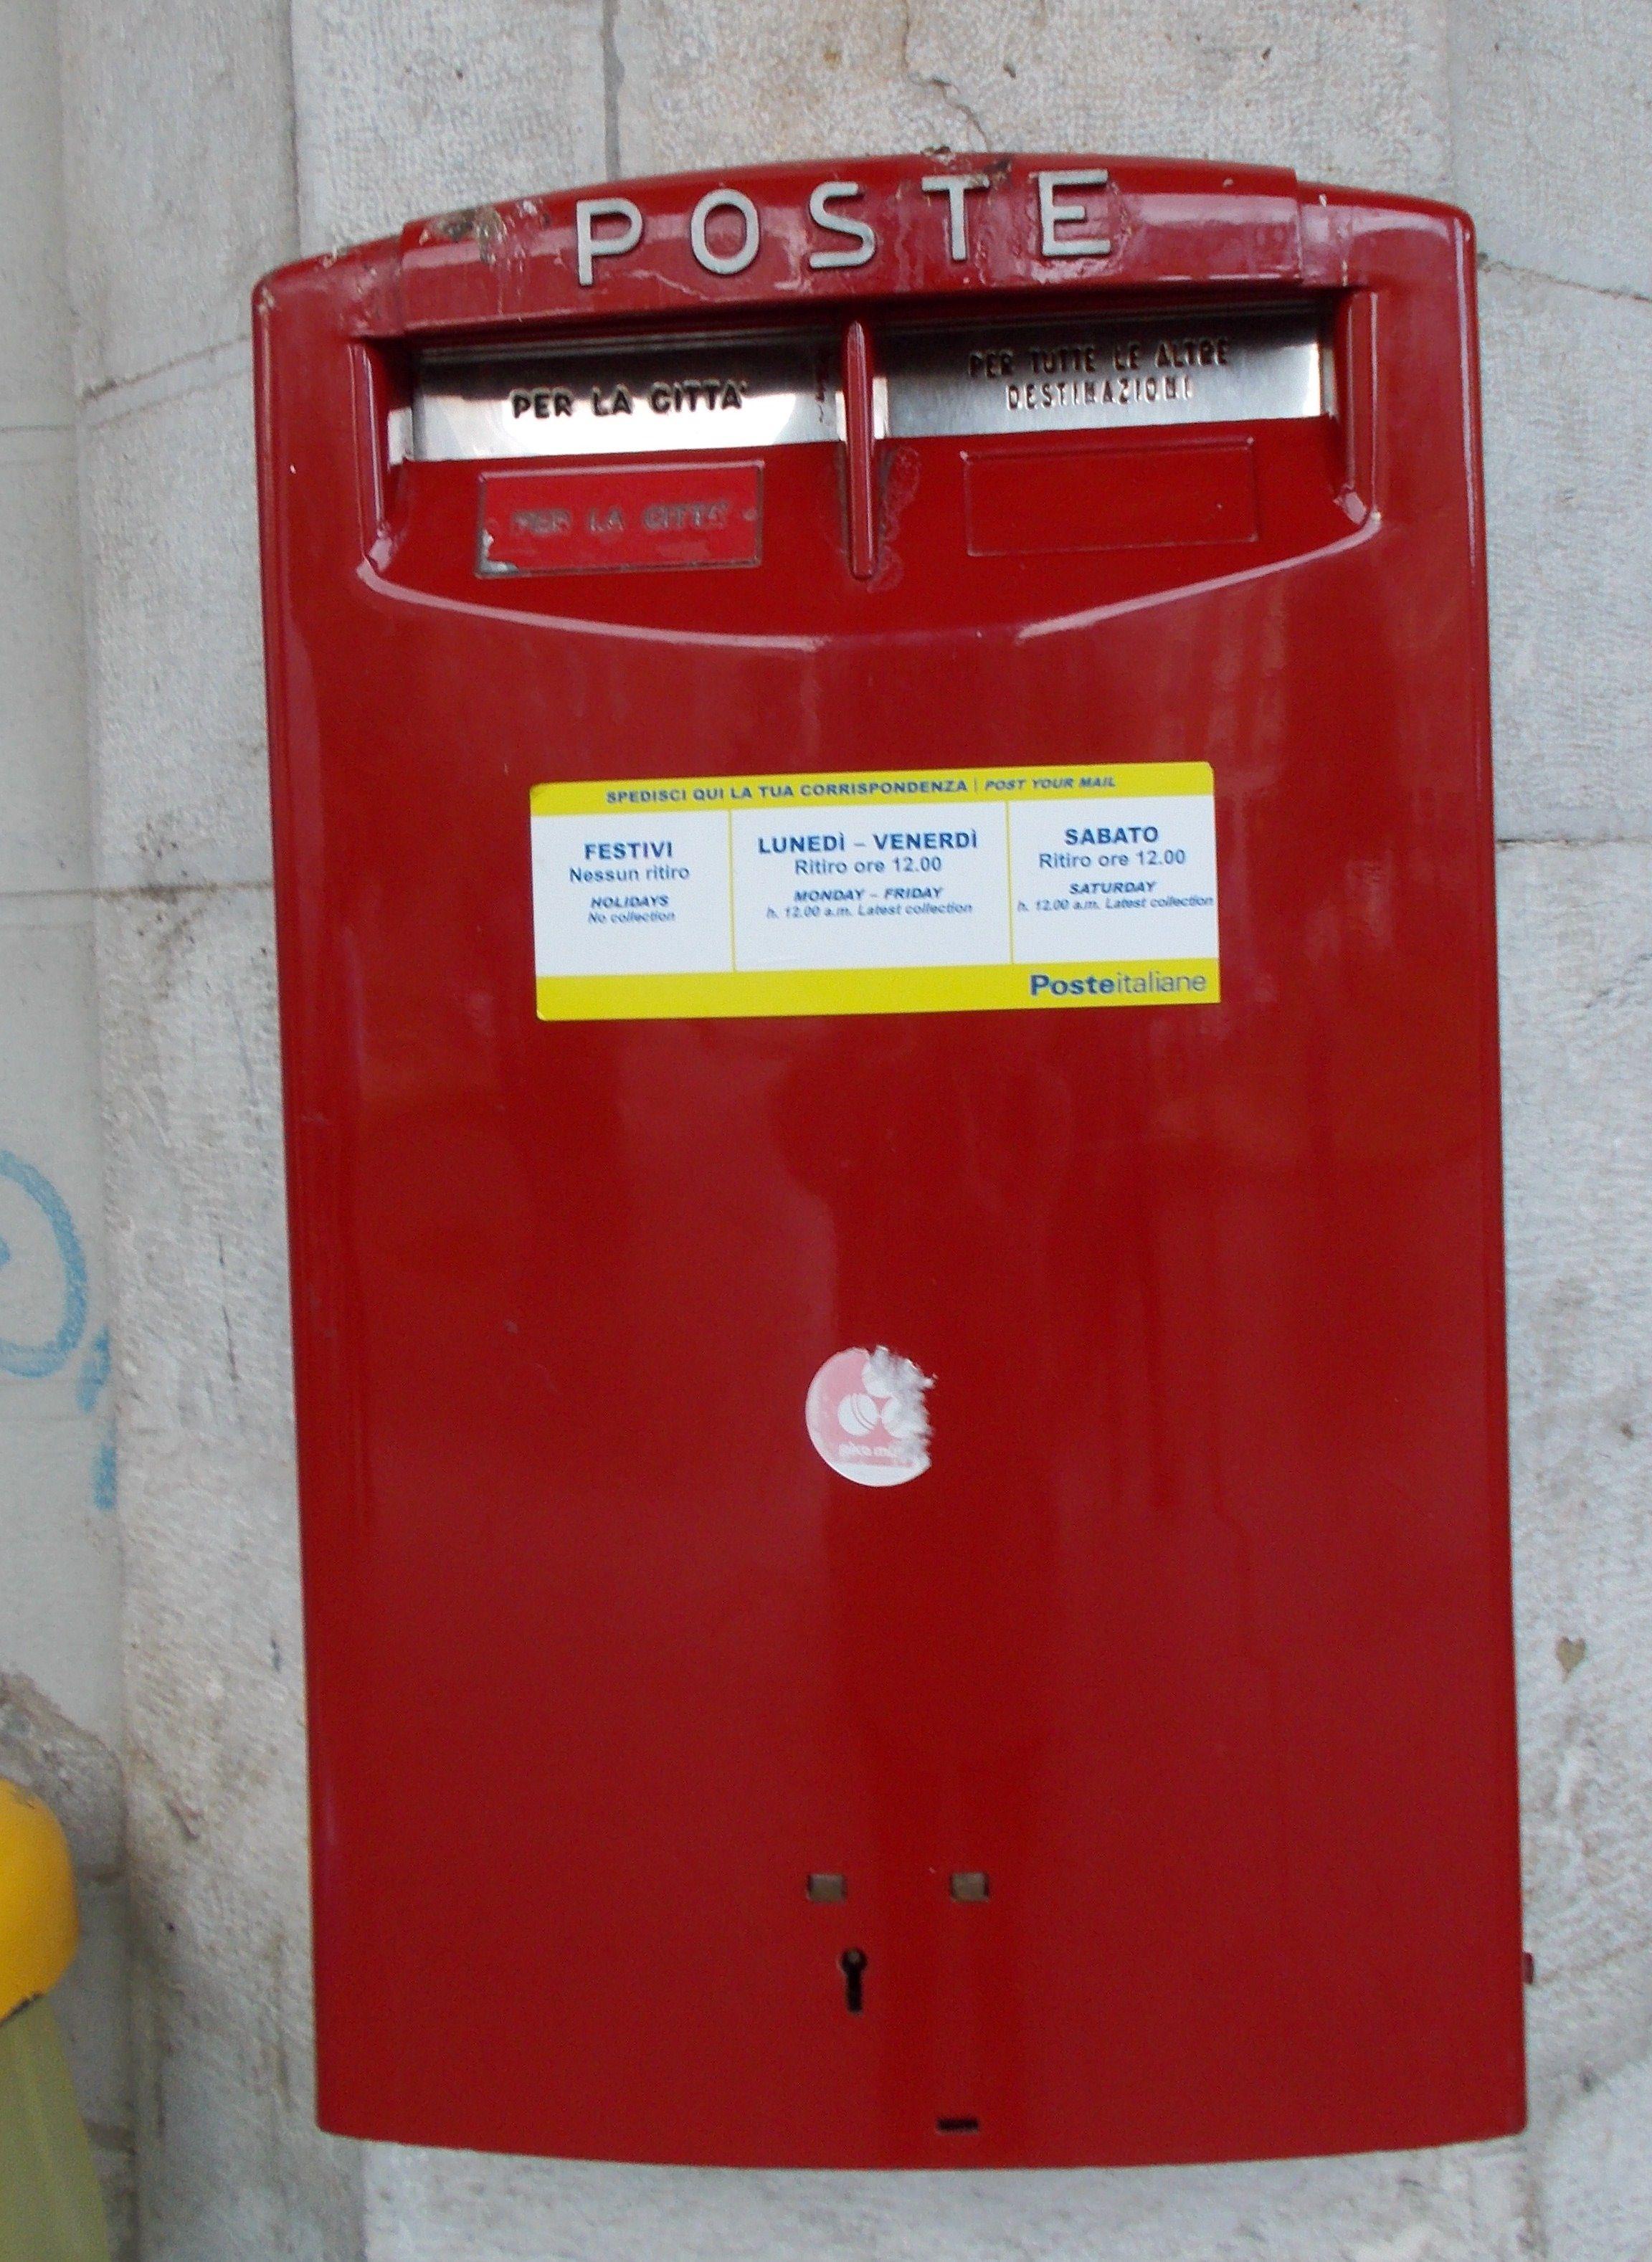 Cassetta Postale Cassetta Postale Cassettiere Idee